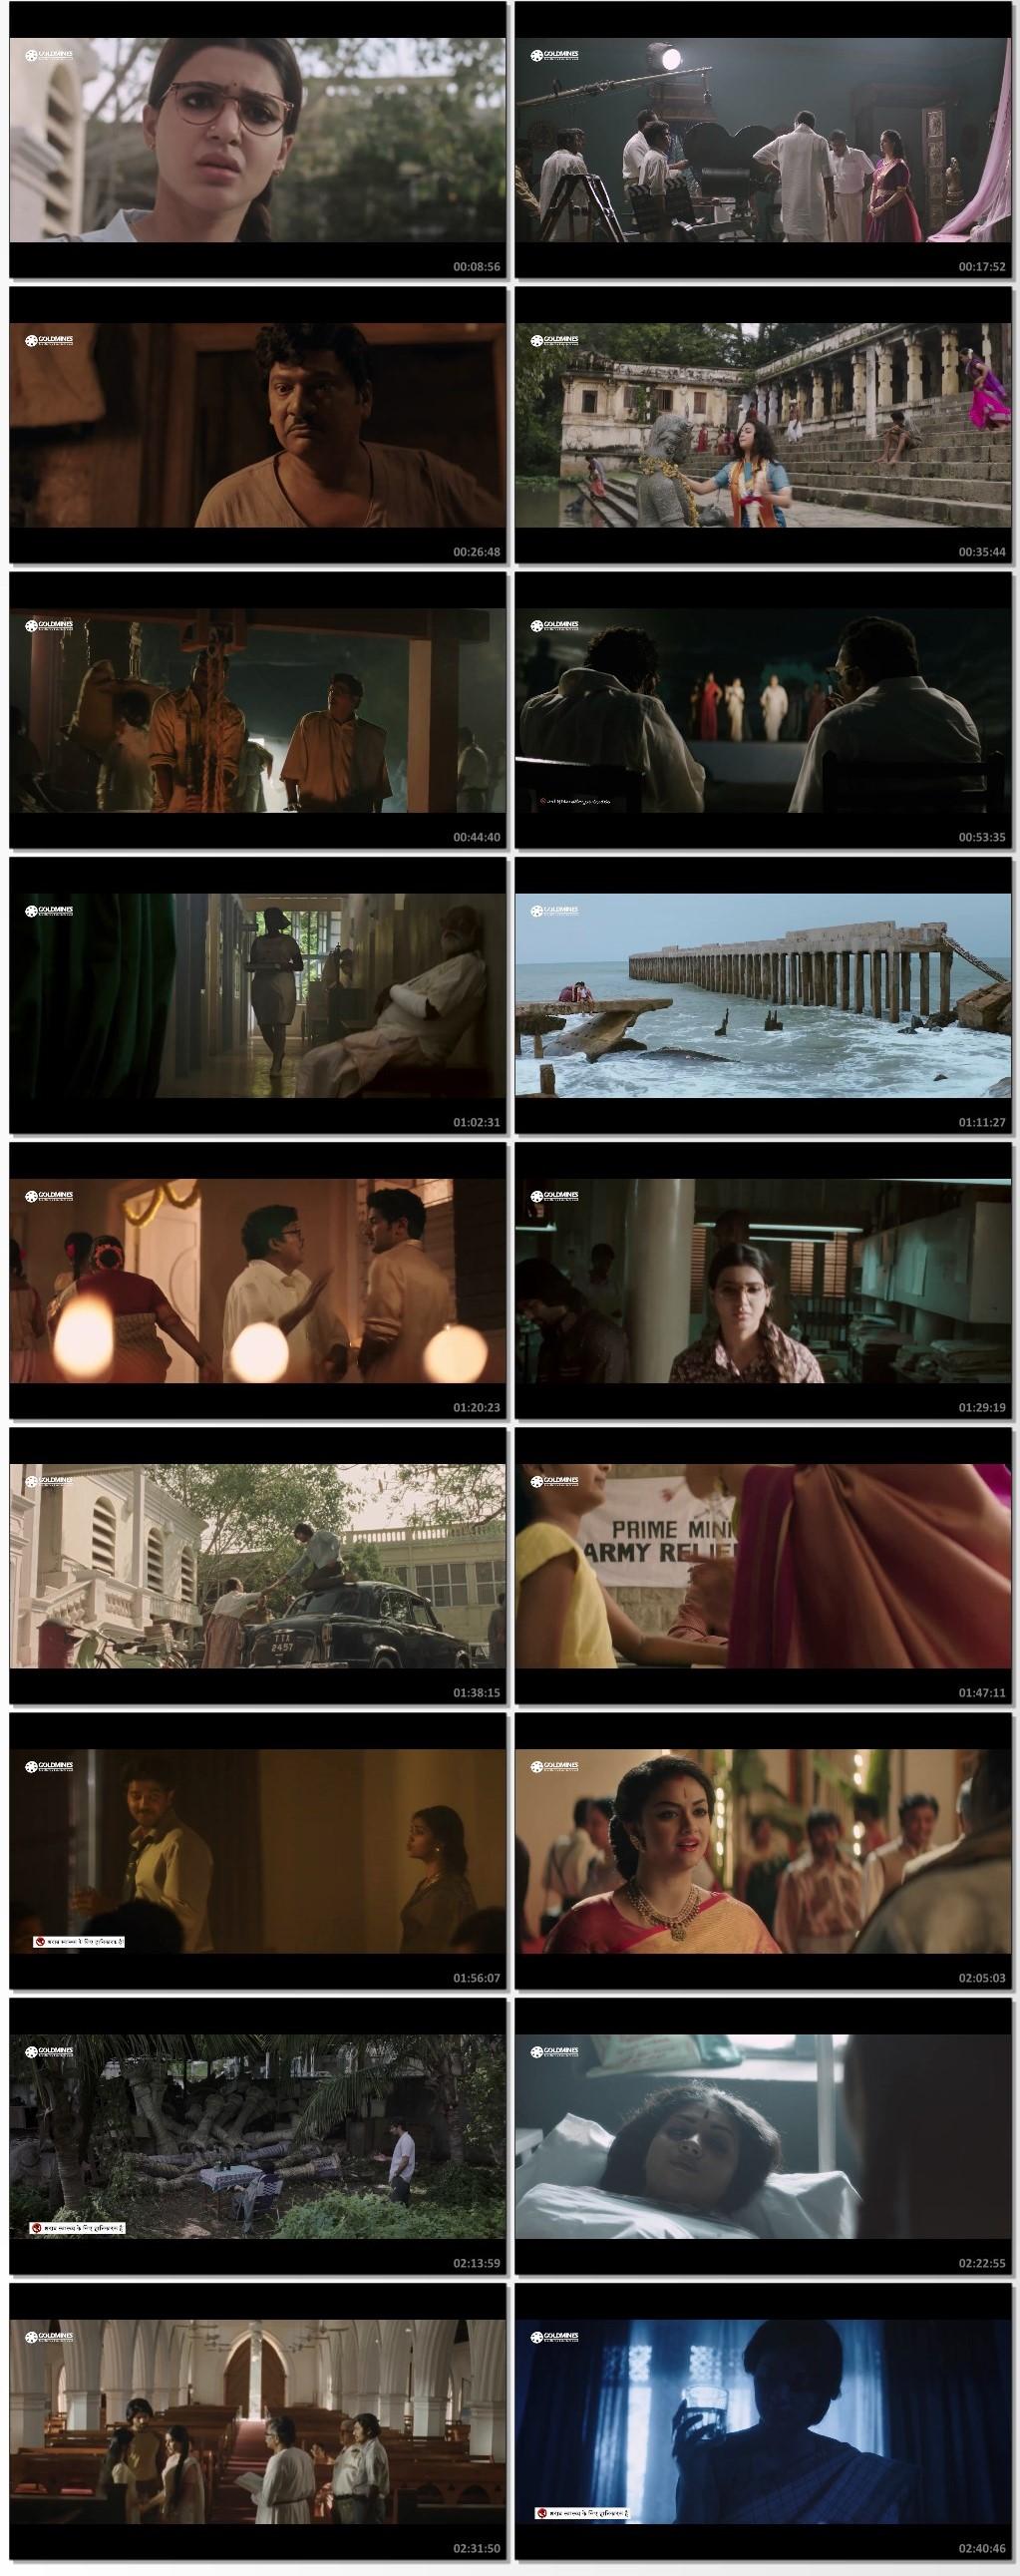 Mahanati-2021-Hindi-Dubbed-1080p-7-Star-HD-Mx-mp4-thumbs82f6ed5ab3d1c05e